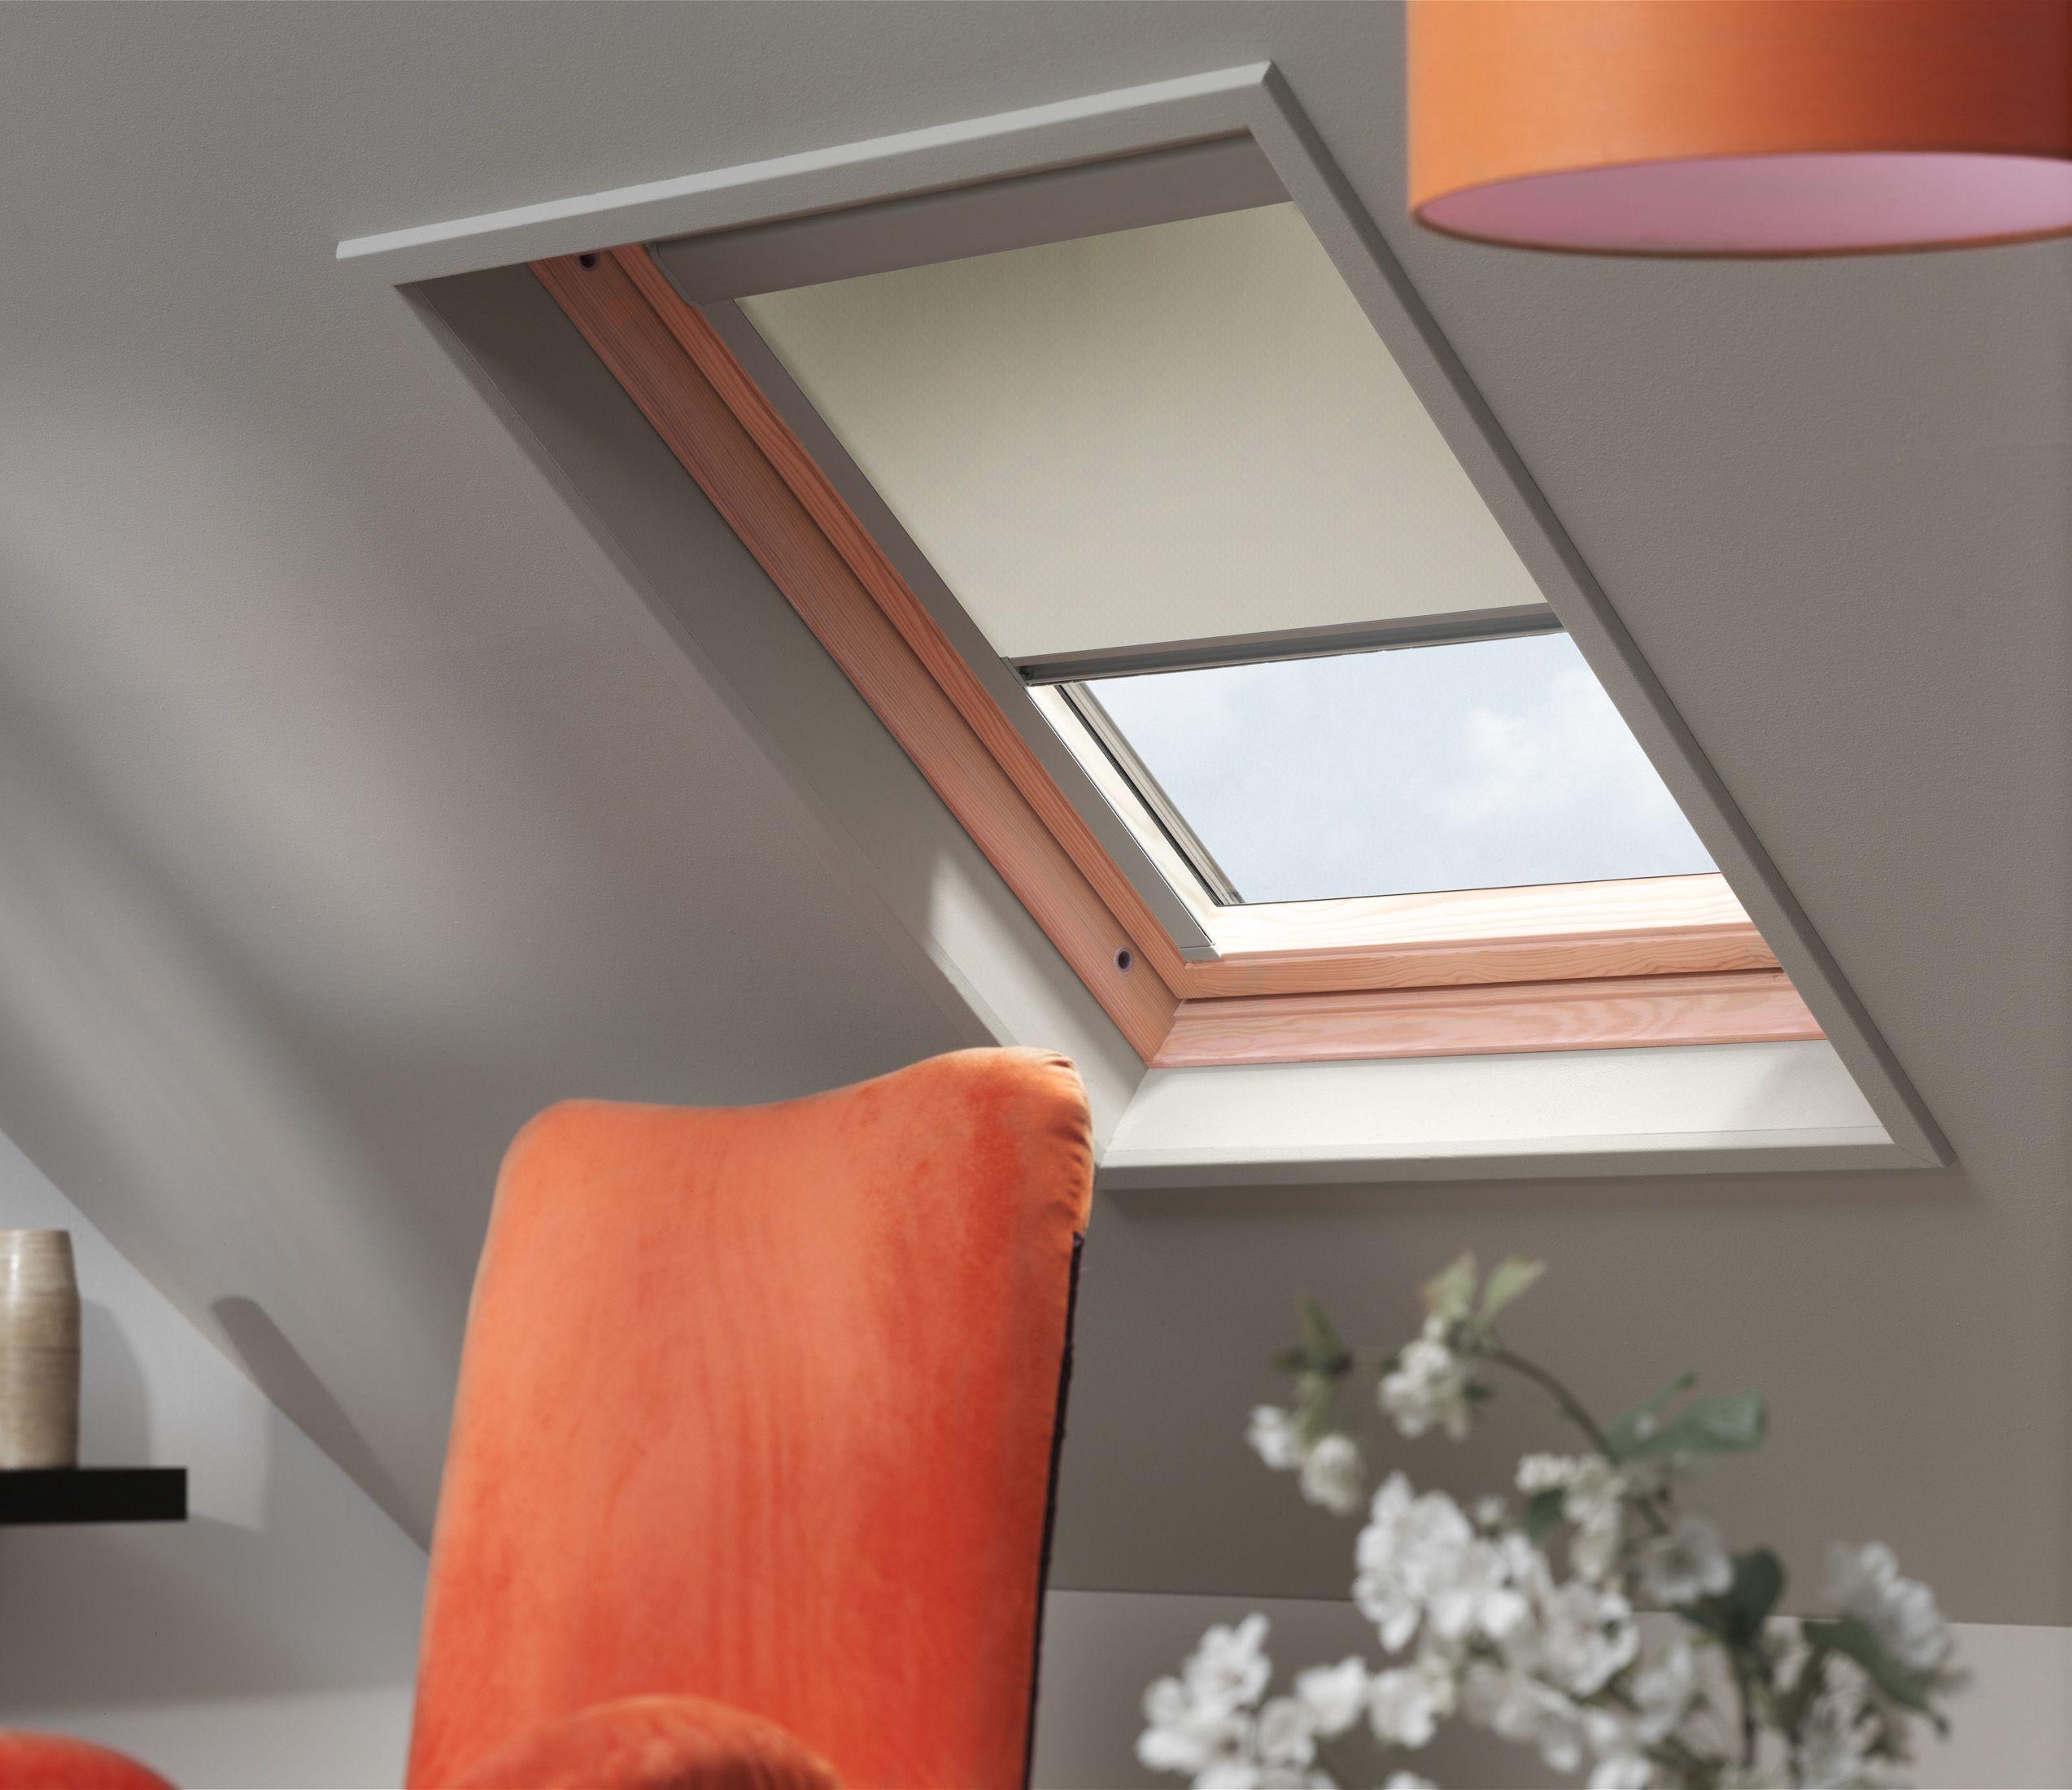 window shades drapery blinds skylight connection aus sl